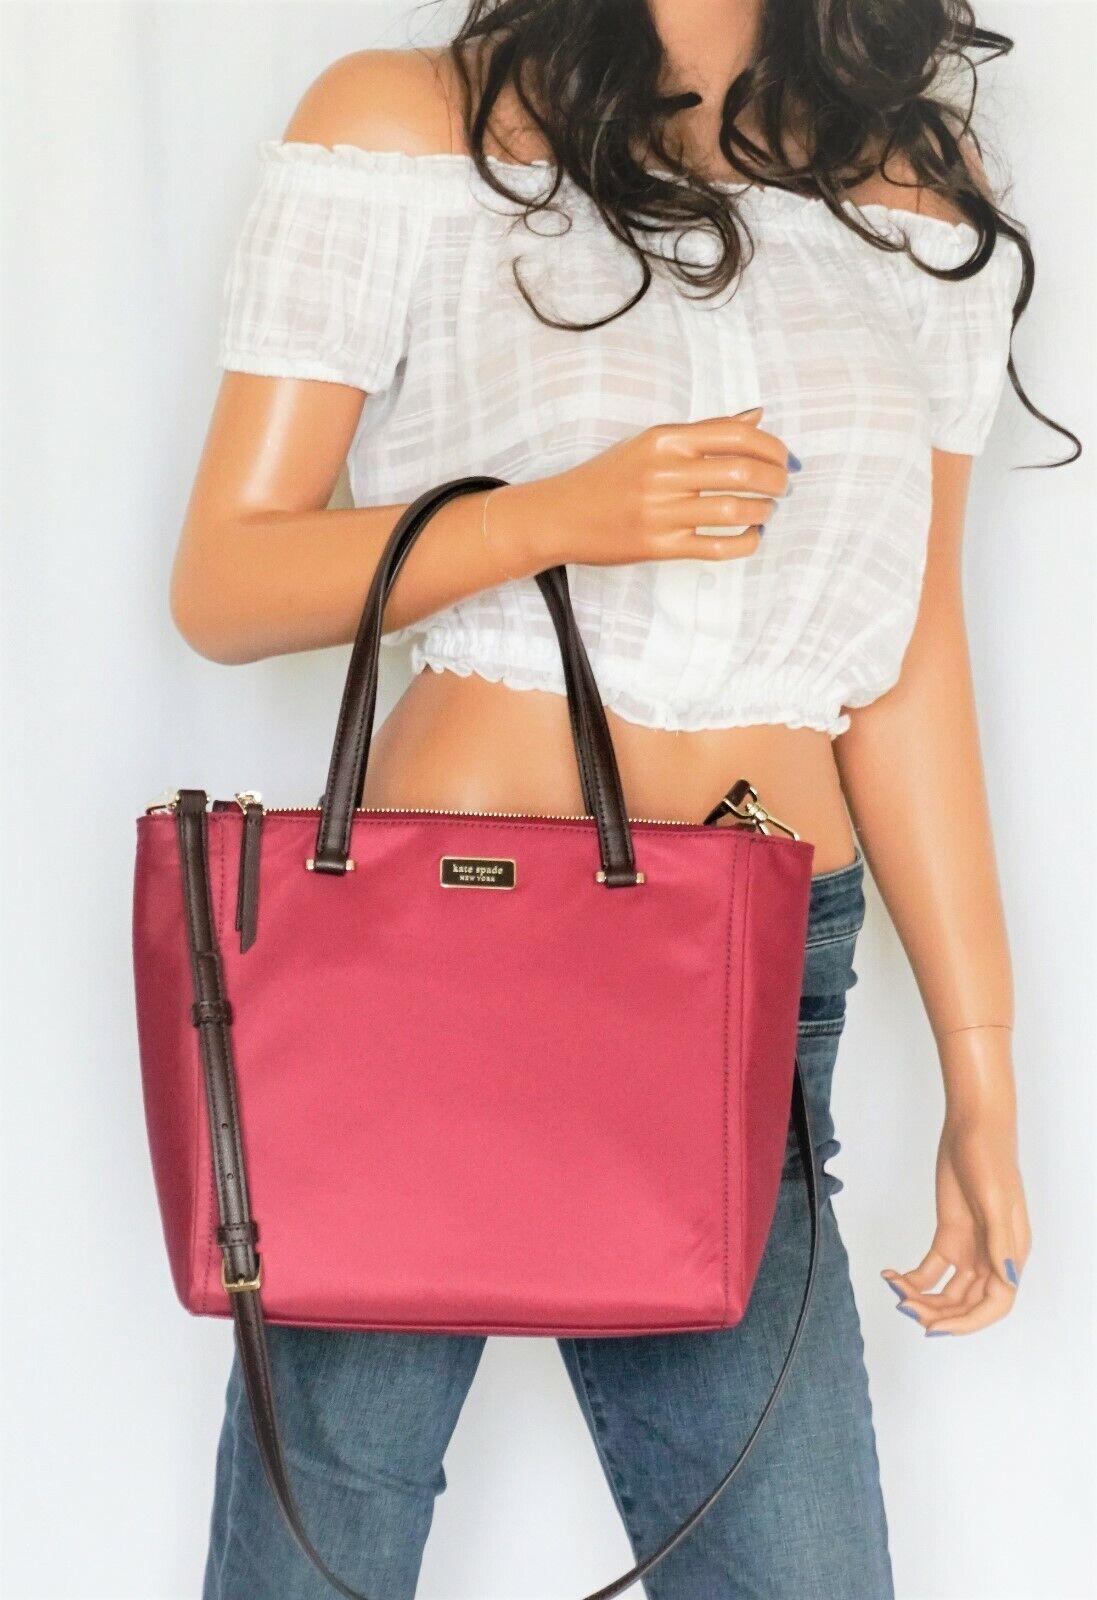 New Kate Spade New York Dawn Medium Satchel Nylon handbag Rh